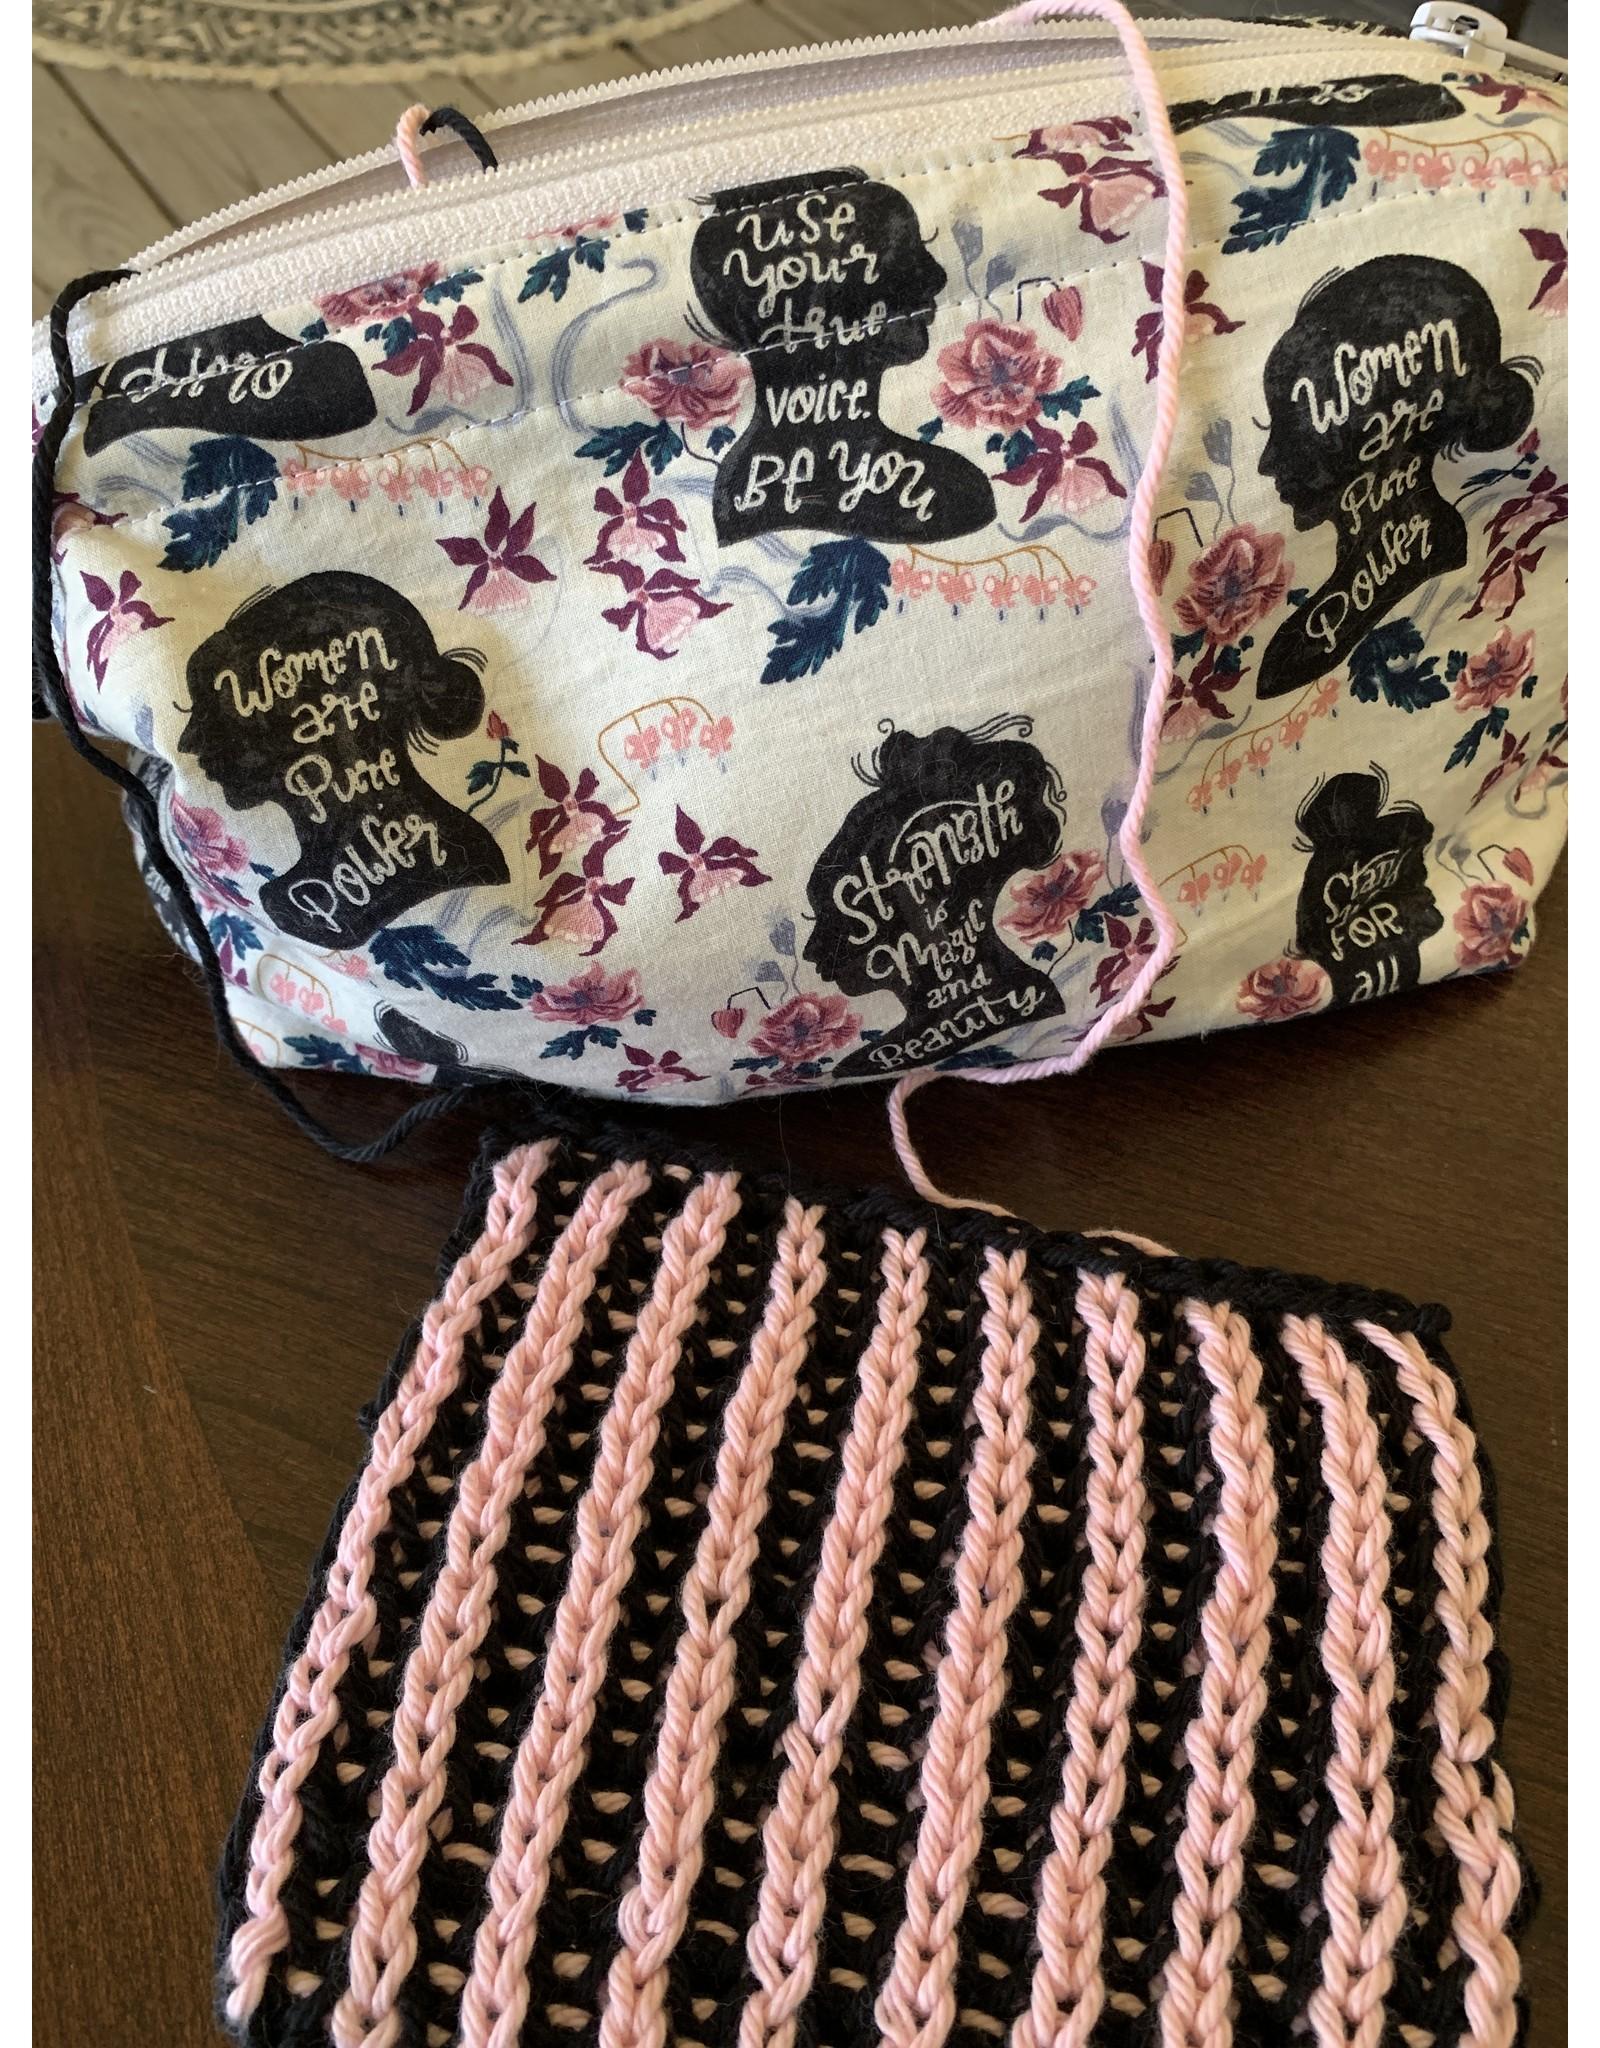 In store Class 217 Brioche Knitting 101: Coaster